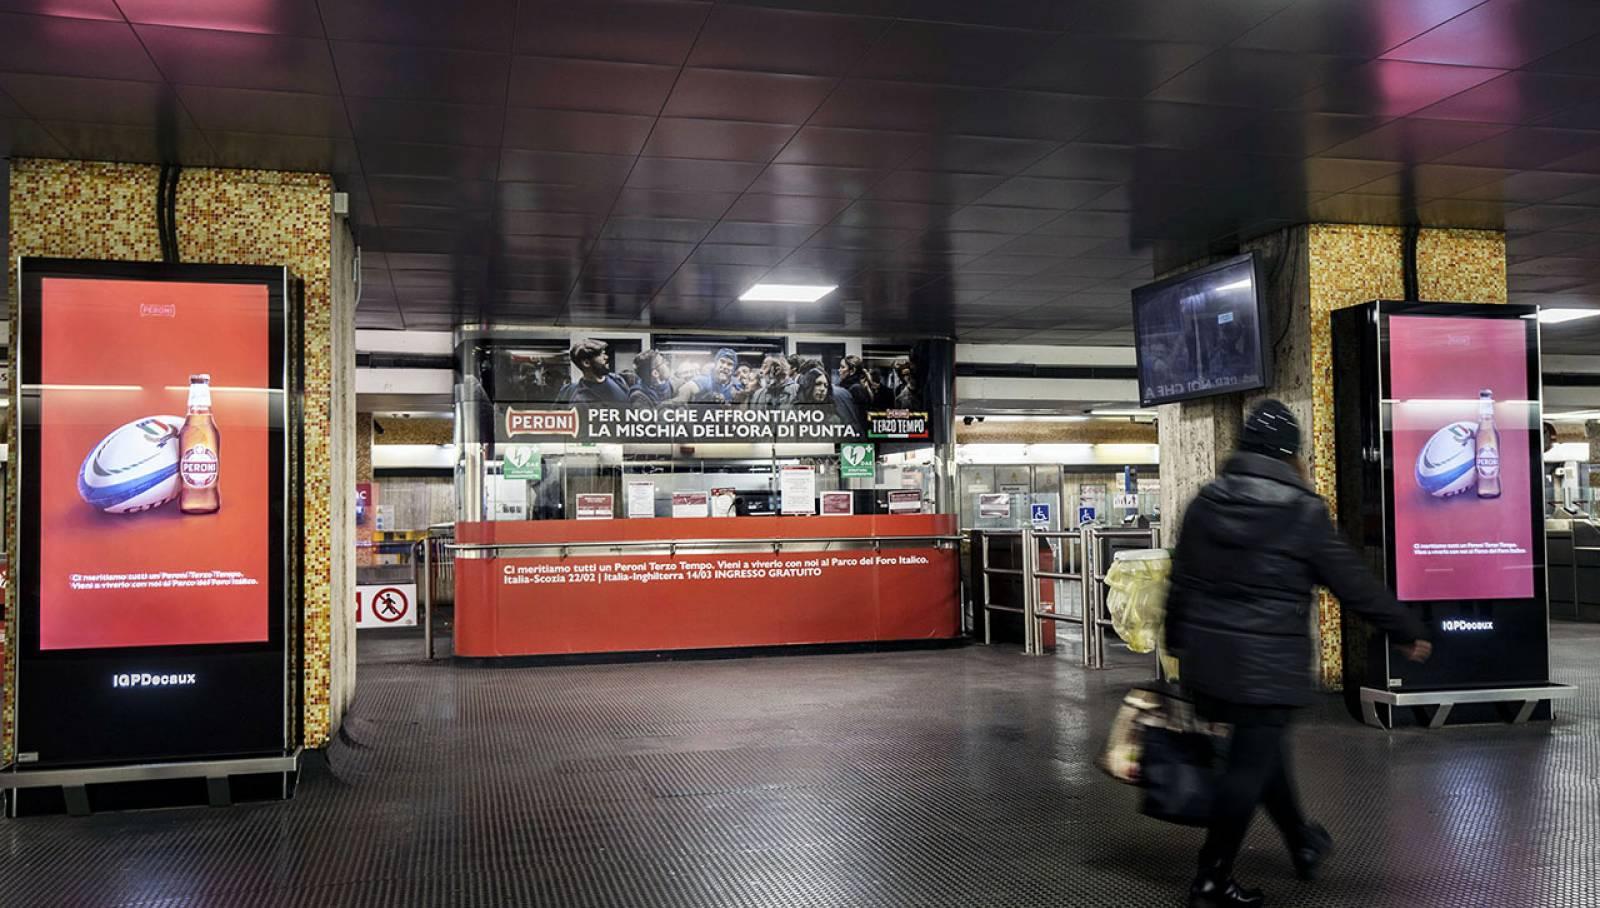 Pubblicità Out of Home IGPDecaux Roma Station Domination per Peroni